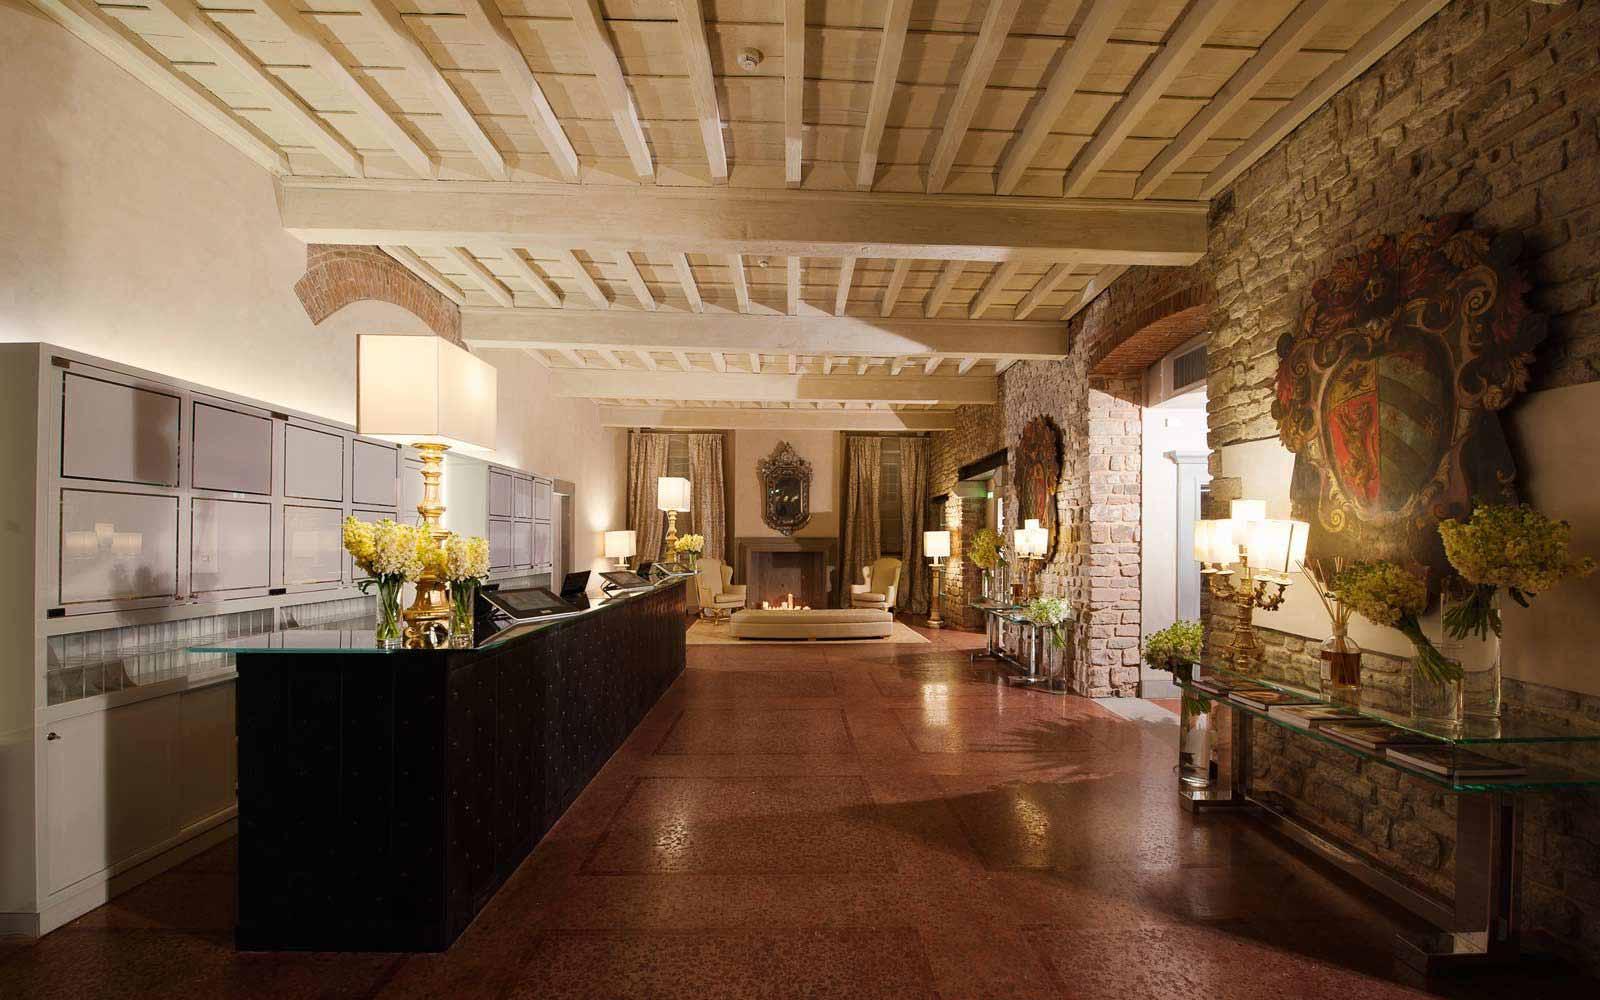 Reception hall at Hotel Brunelleschi